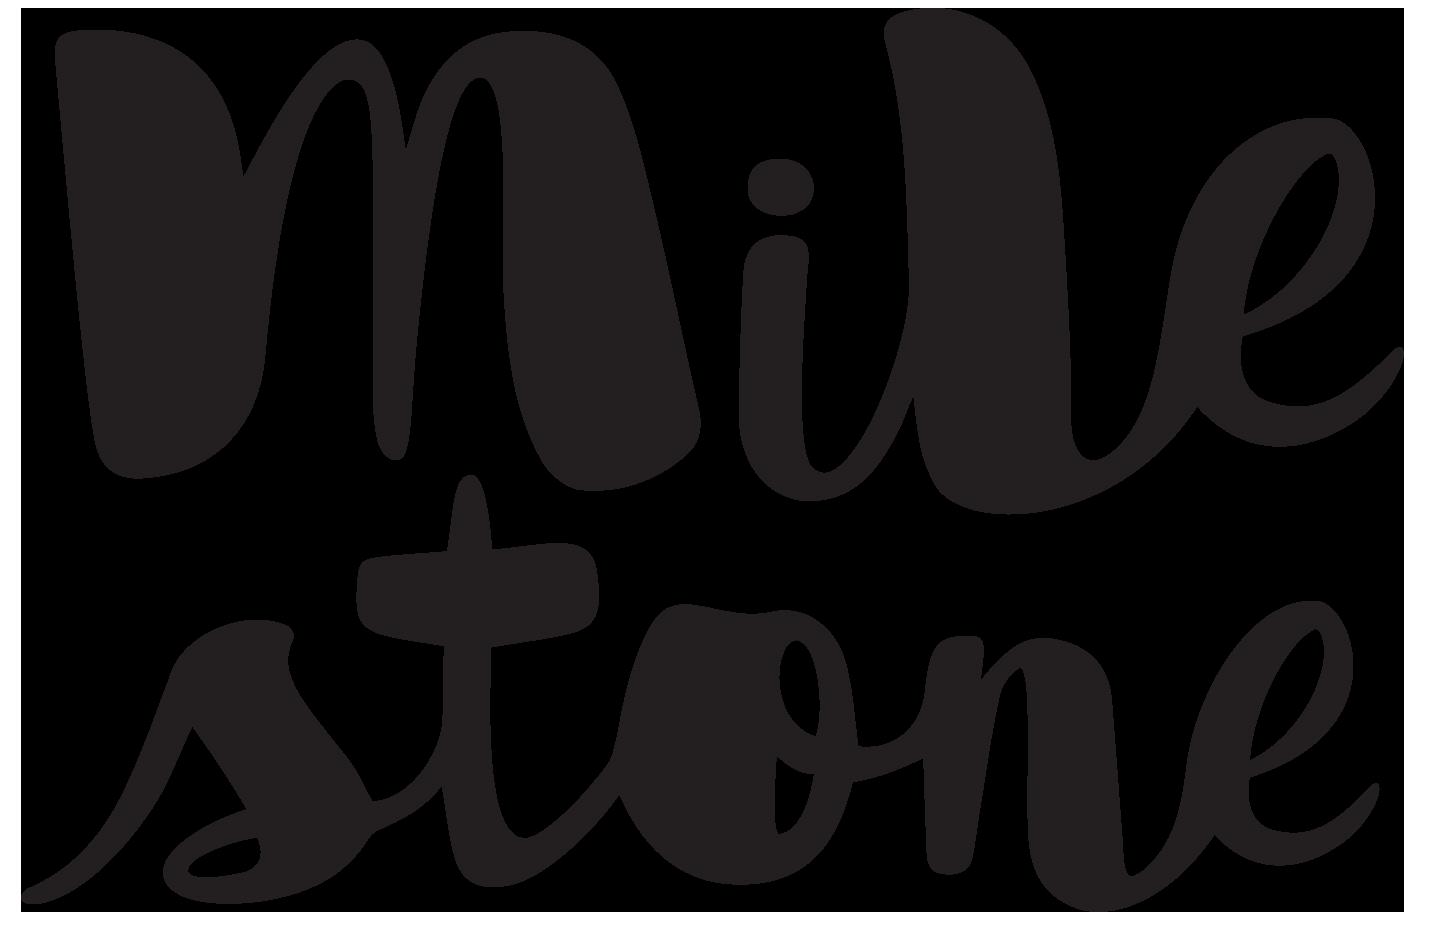 Milestone_logo_2015-black.png